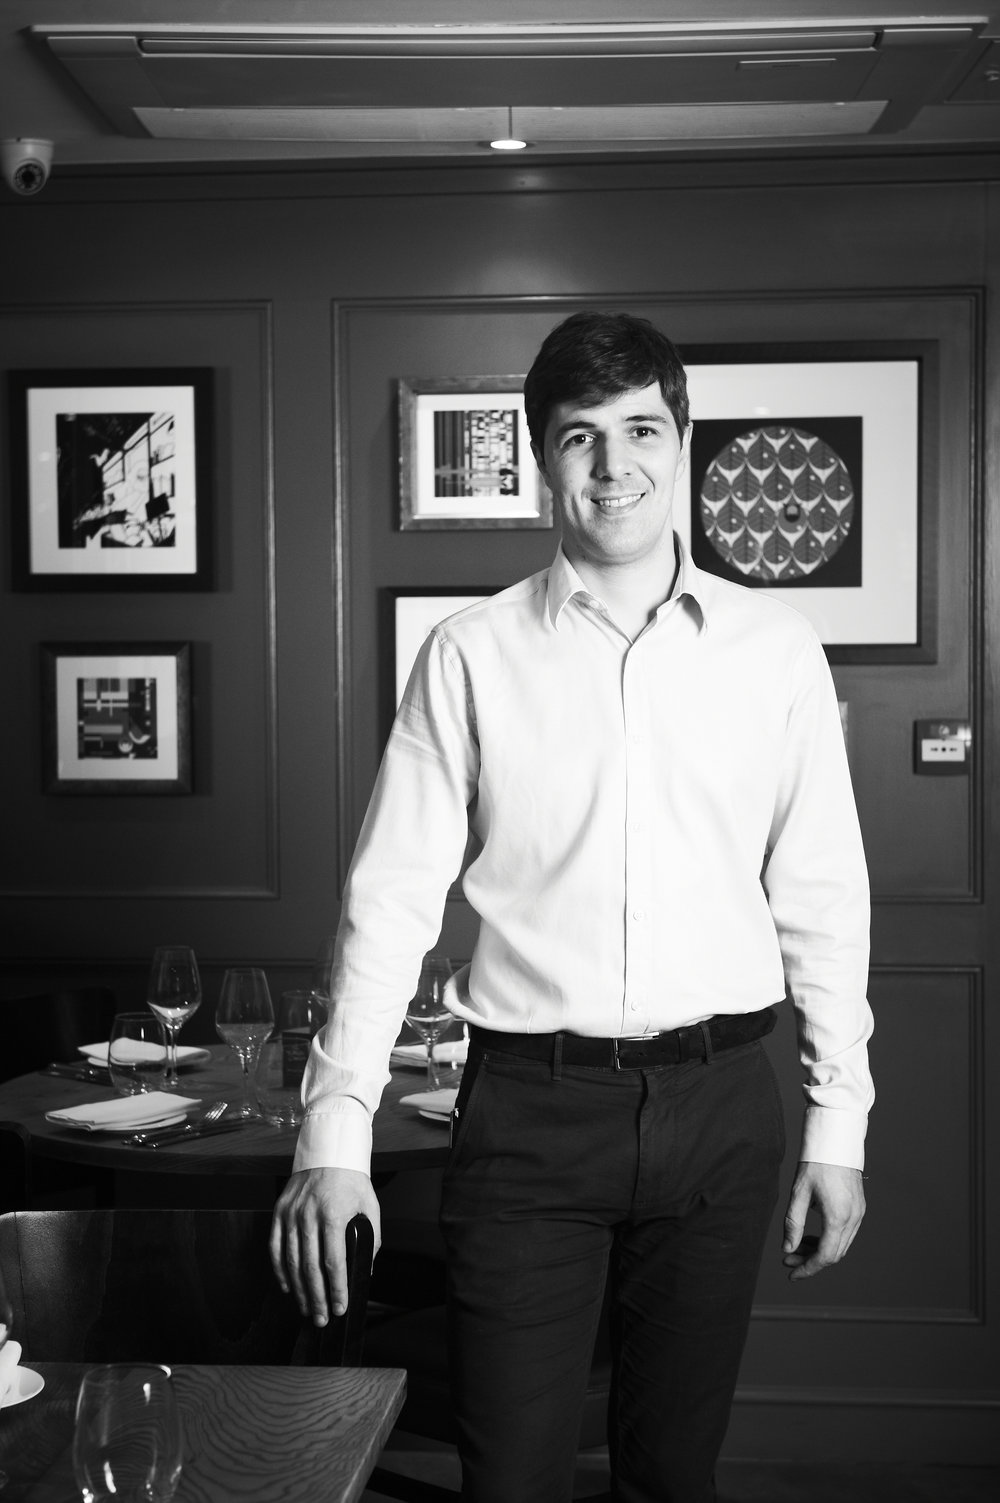 Pedro Borges Restaurant Manager